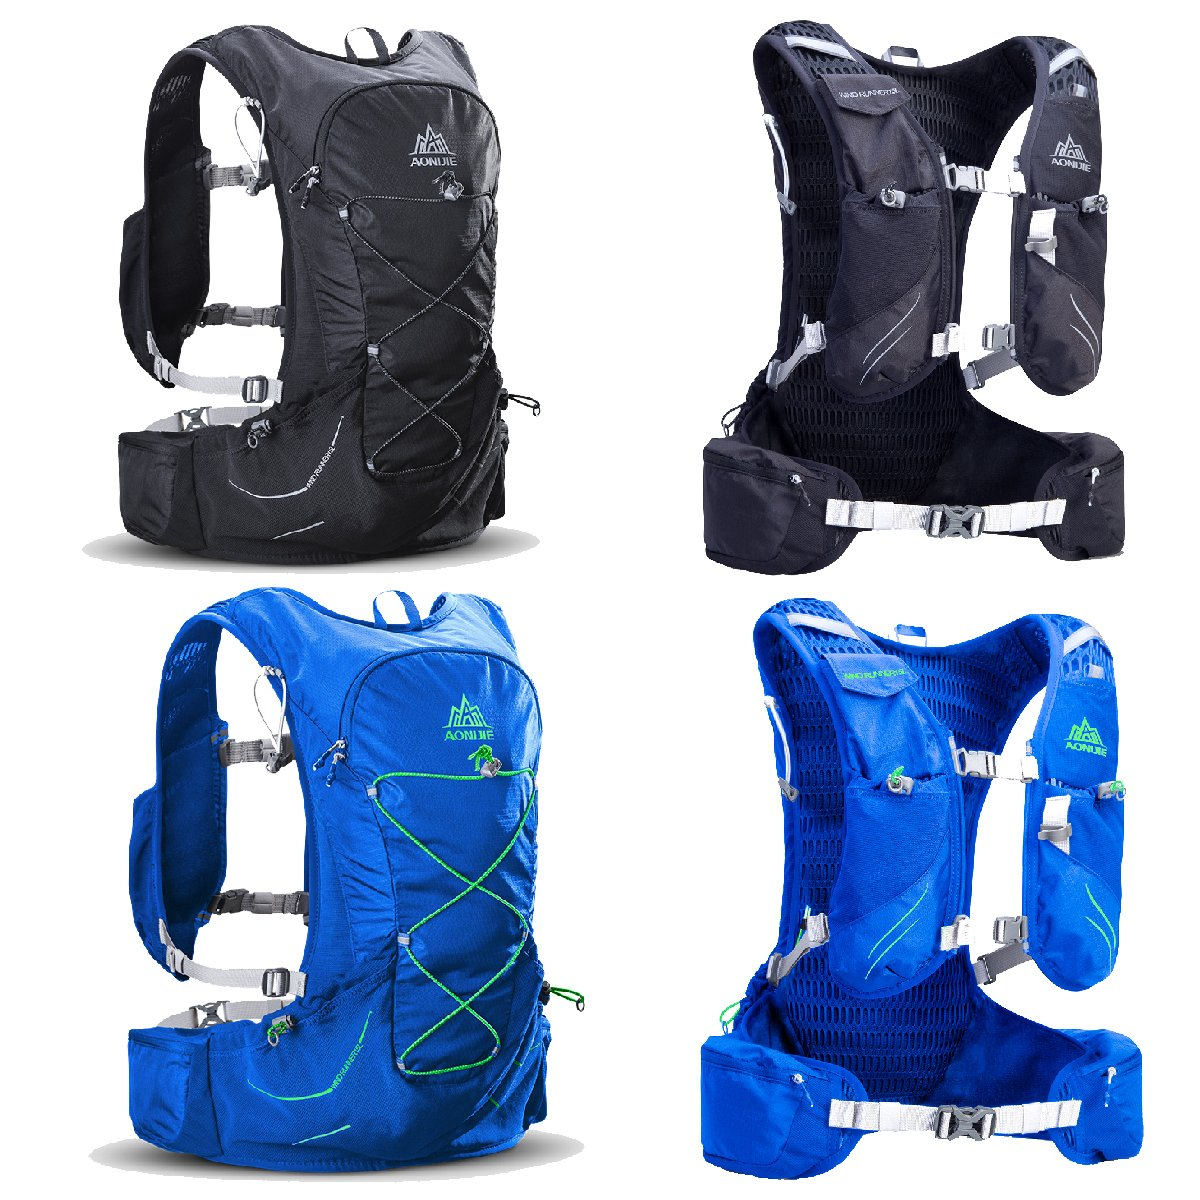 Amazon.com : TRIWONDER 15L Hydration Pack Ultra Trail Running Vest Marathon Backpack with Hydration Bladder (Black - with 2L Water Bladder) : Sports & ...